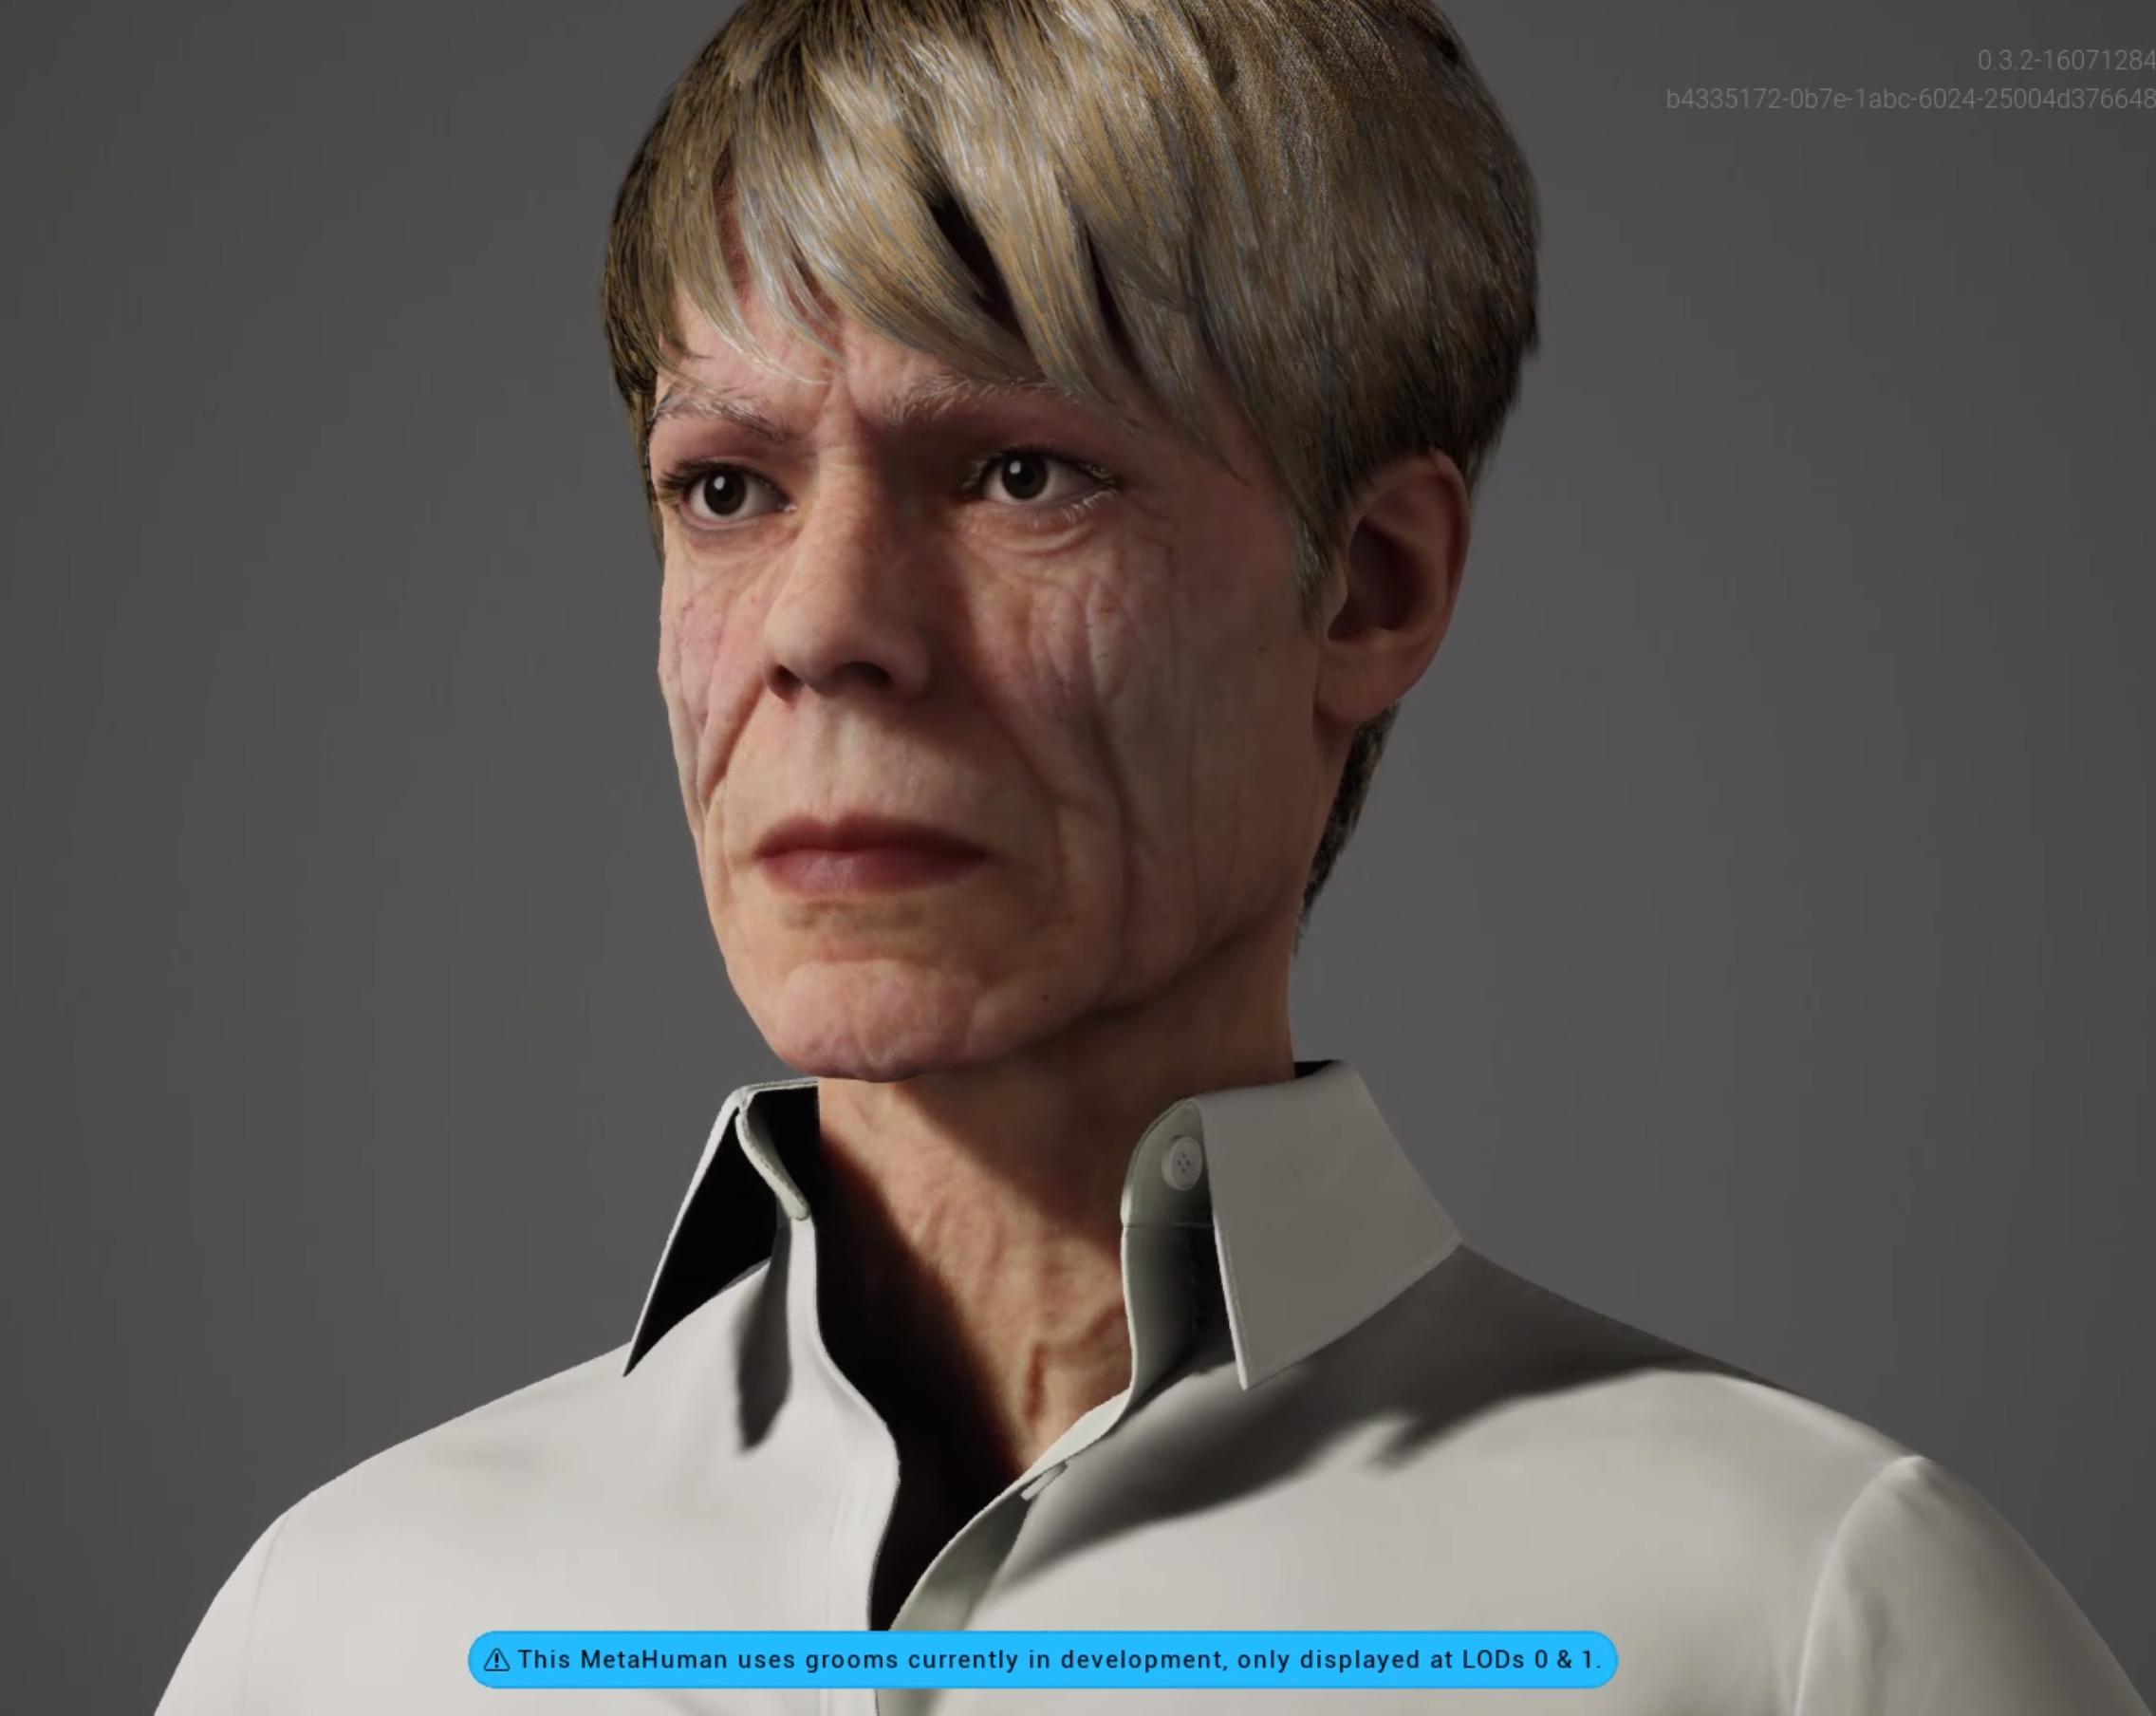 This is Calixia a MetaHuman created with the Unreal Engine Metahuman Creator